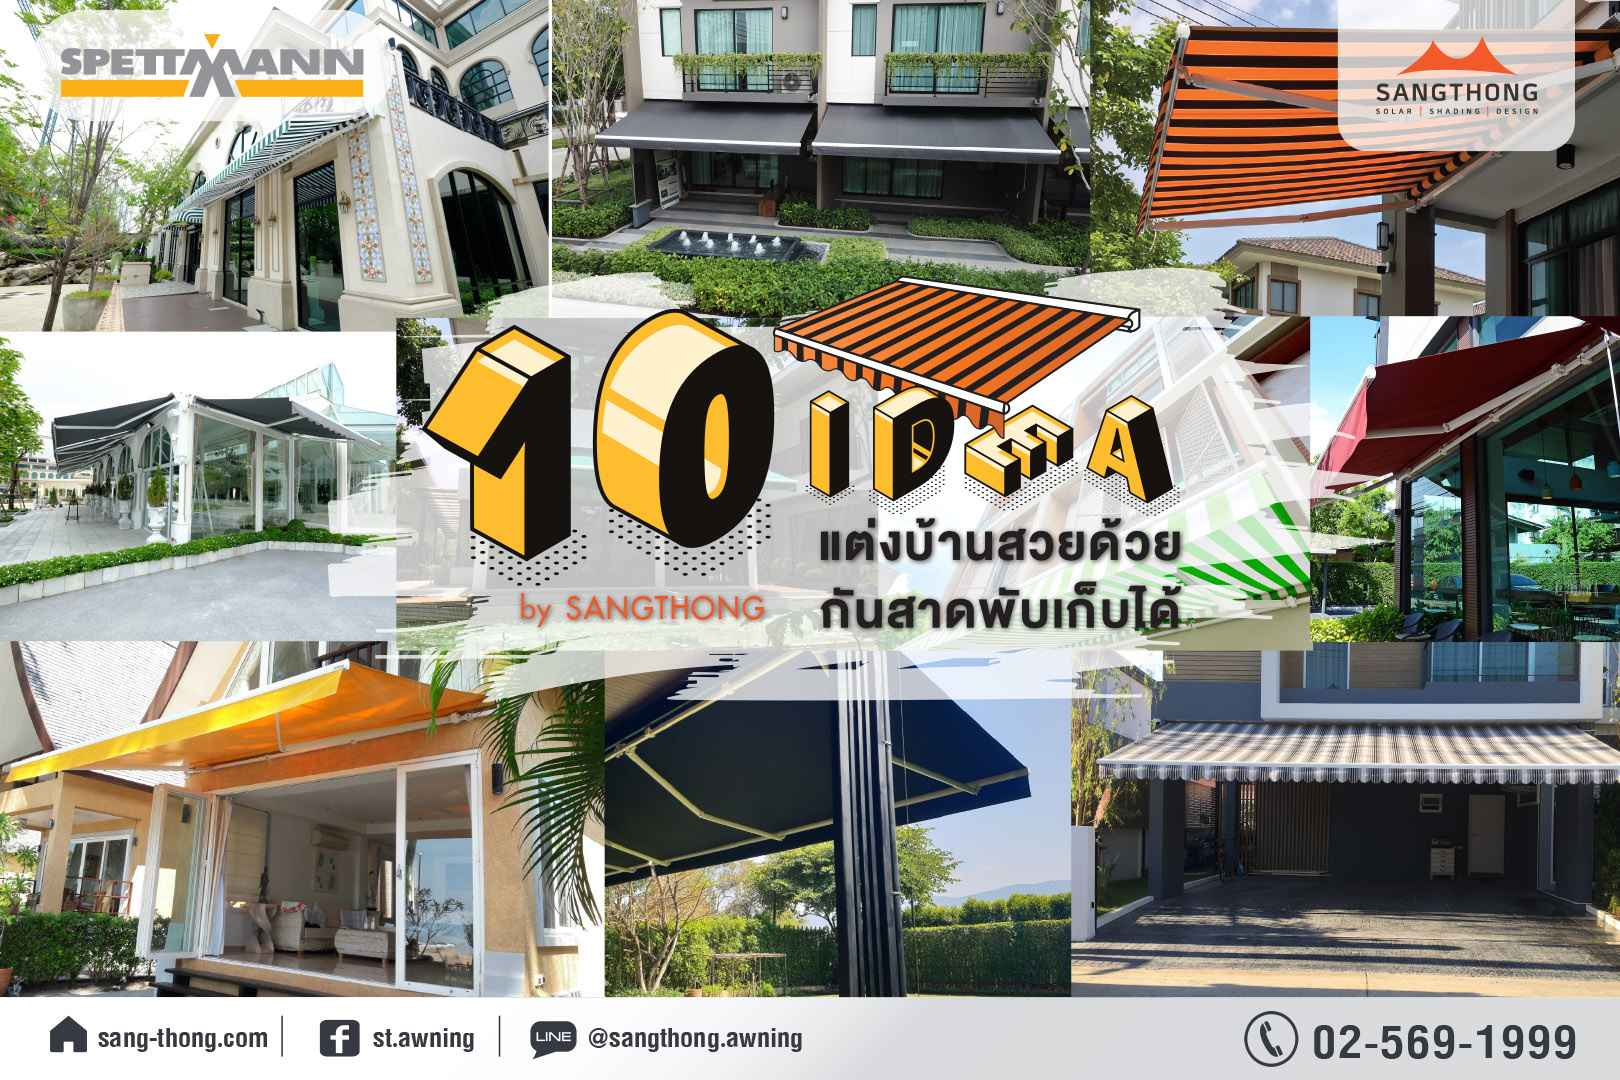 10 IDEA แต่งบ้านสวย ด้วย กันสาดพับเก็บได้ SPETTMANN